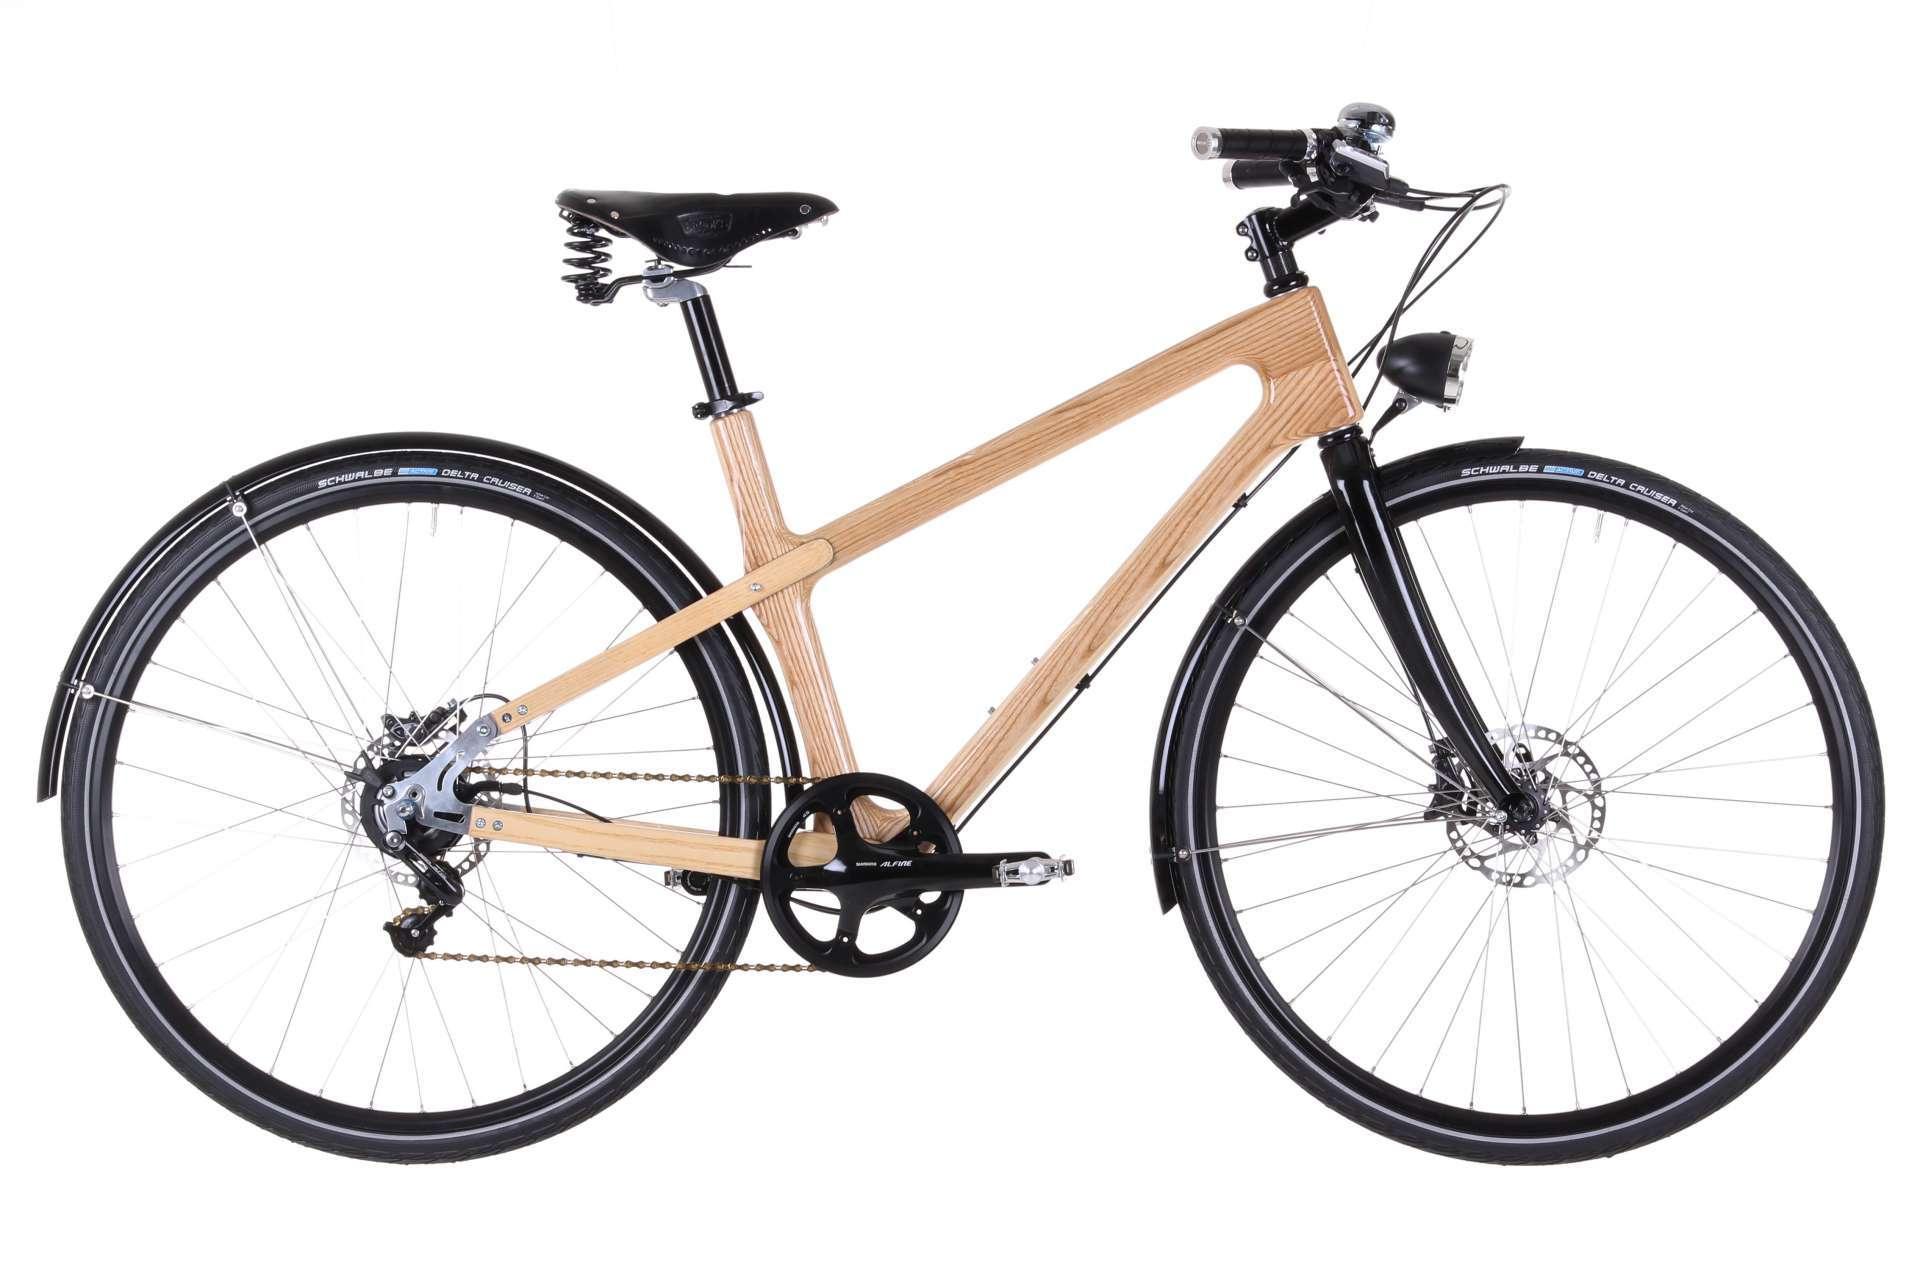 Materia Bikes - Wooden bicycle - City Bike Grace